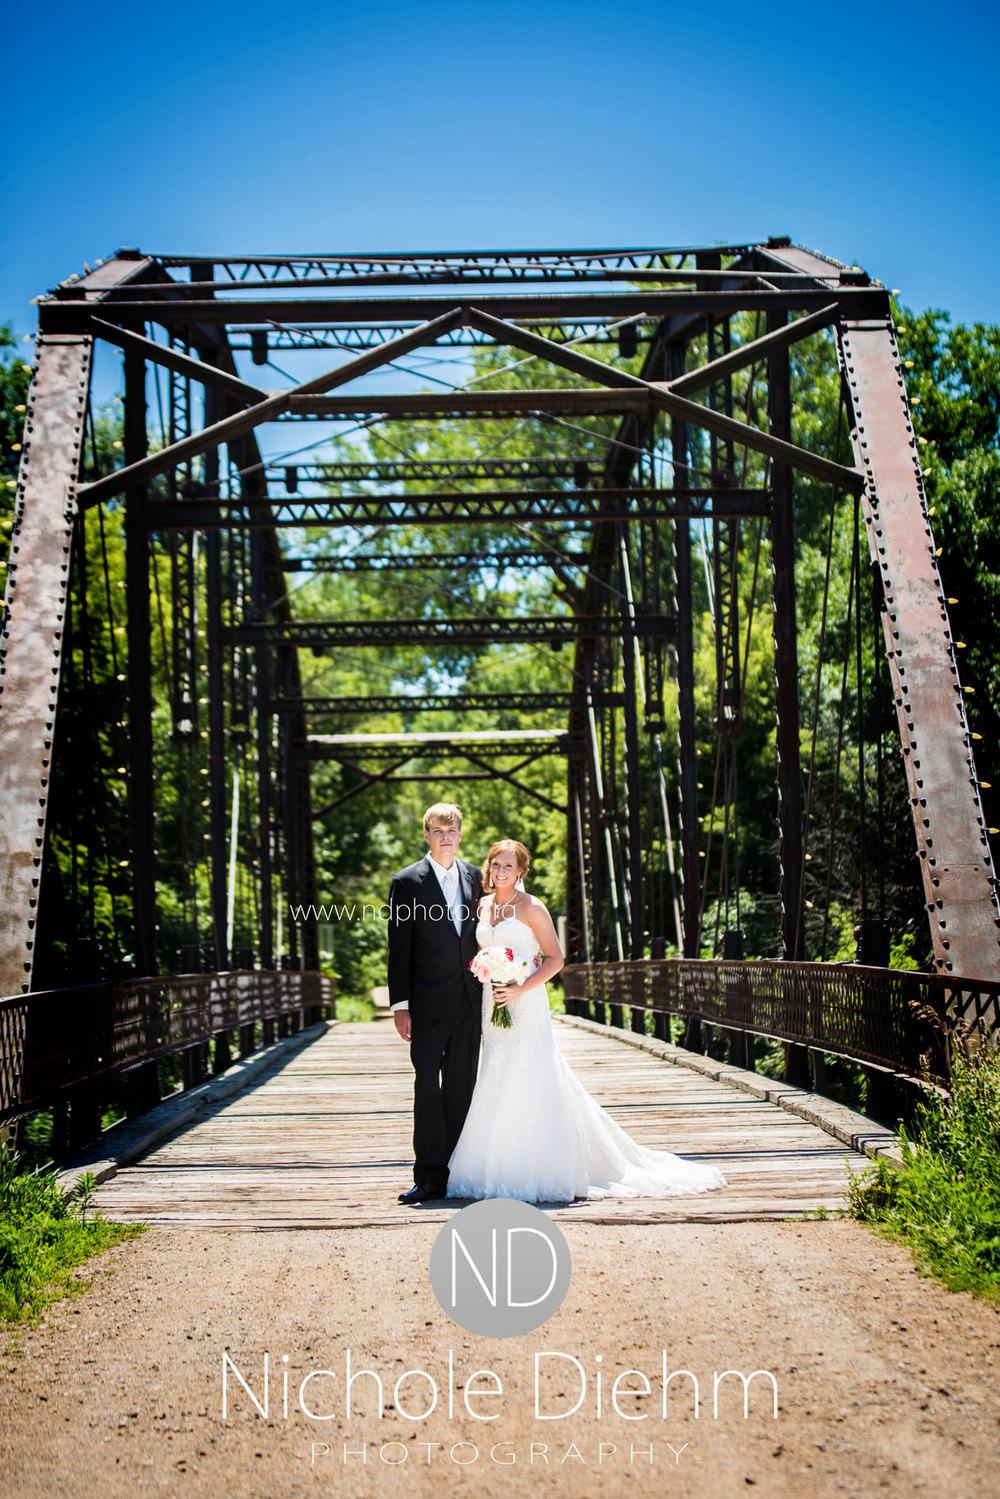 Brook-and-Stu-say-I-do-Cedar-Falls-Spencer-Iowa-Bridge-Smile.jpg